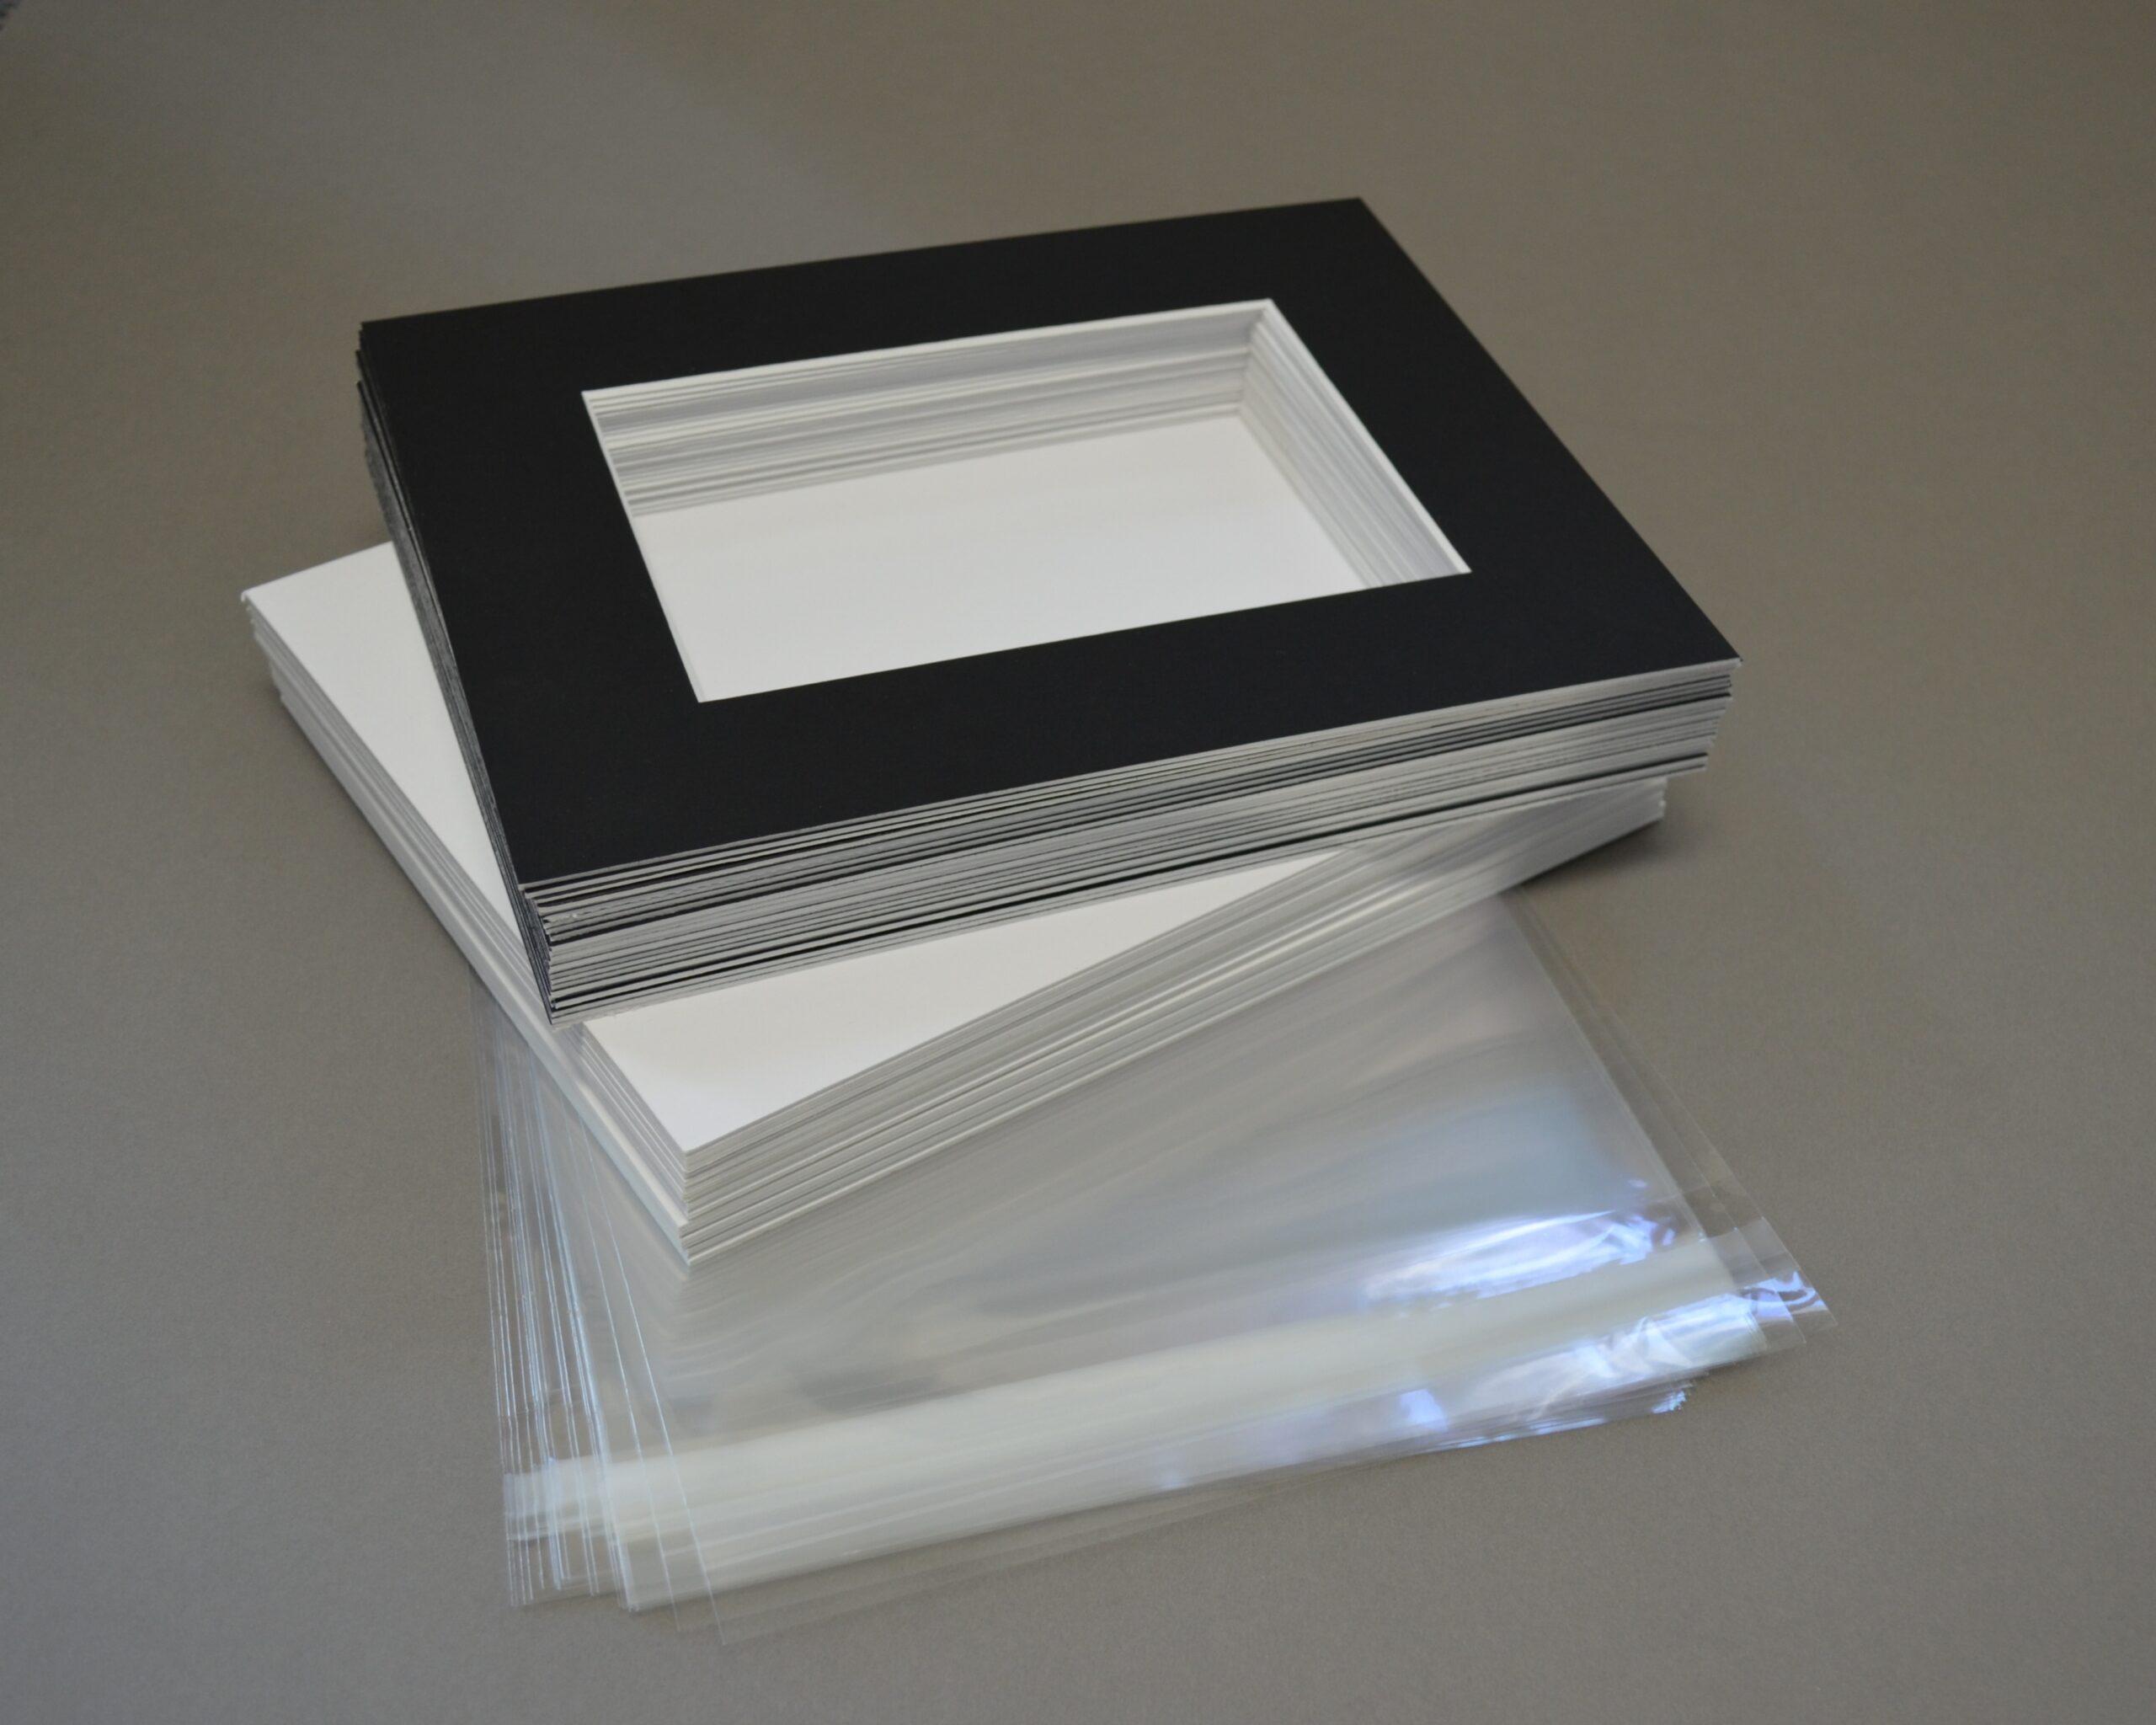 Jet Black Matboard Presentation Kits